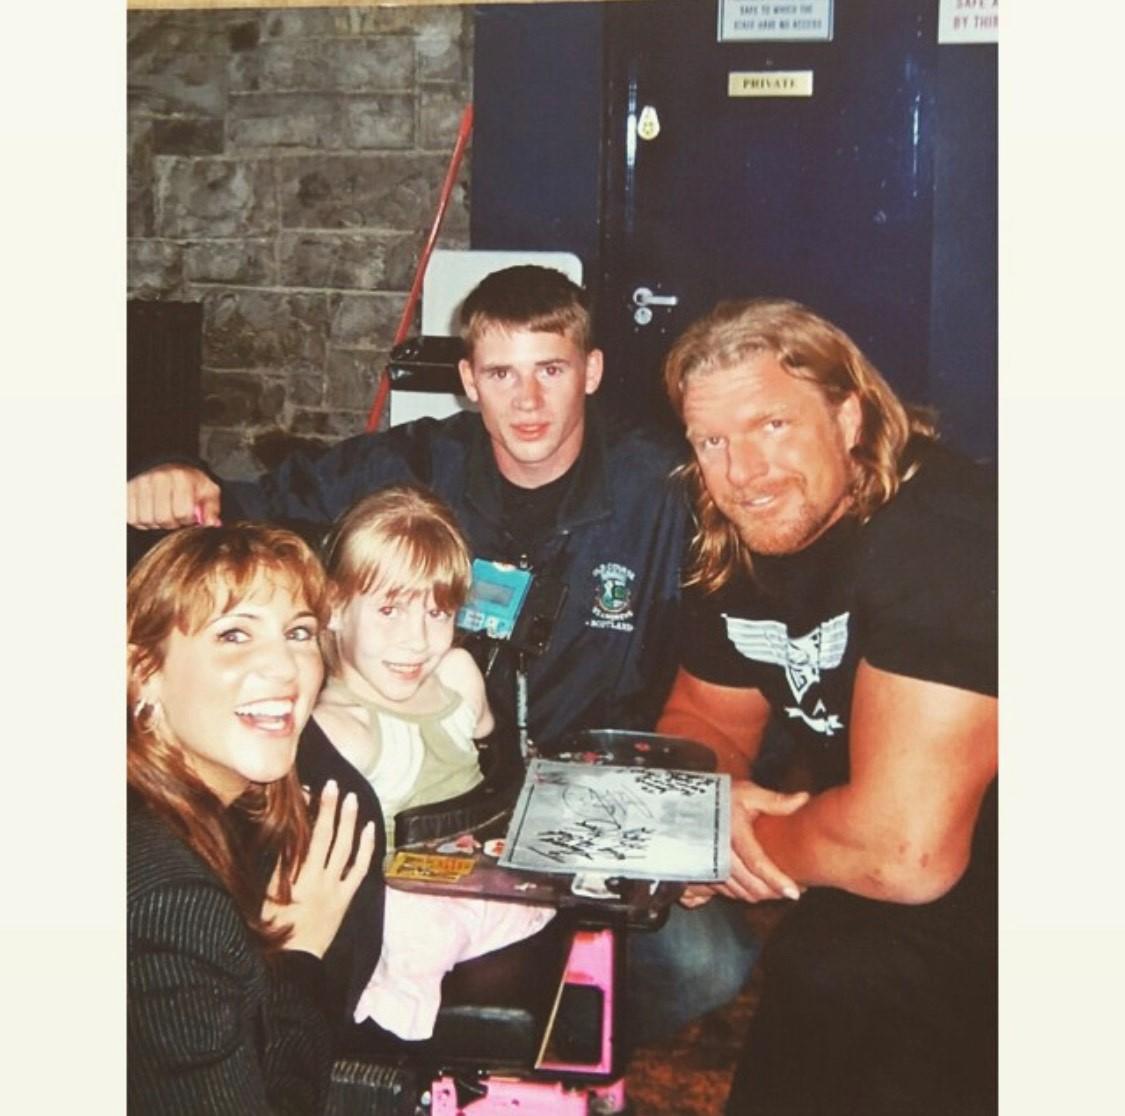 Joanne (8), Stephanie McMahon, Danny O'Riordan and WWE wrestler Triple H © Joanne O'Riordan